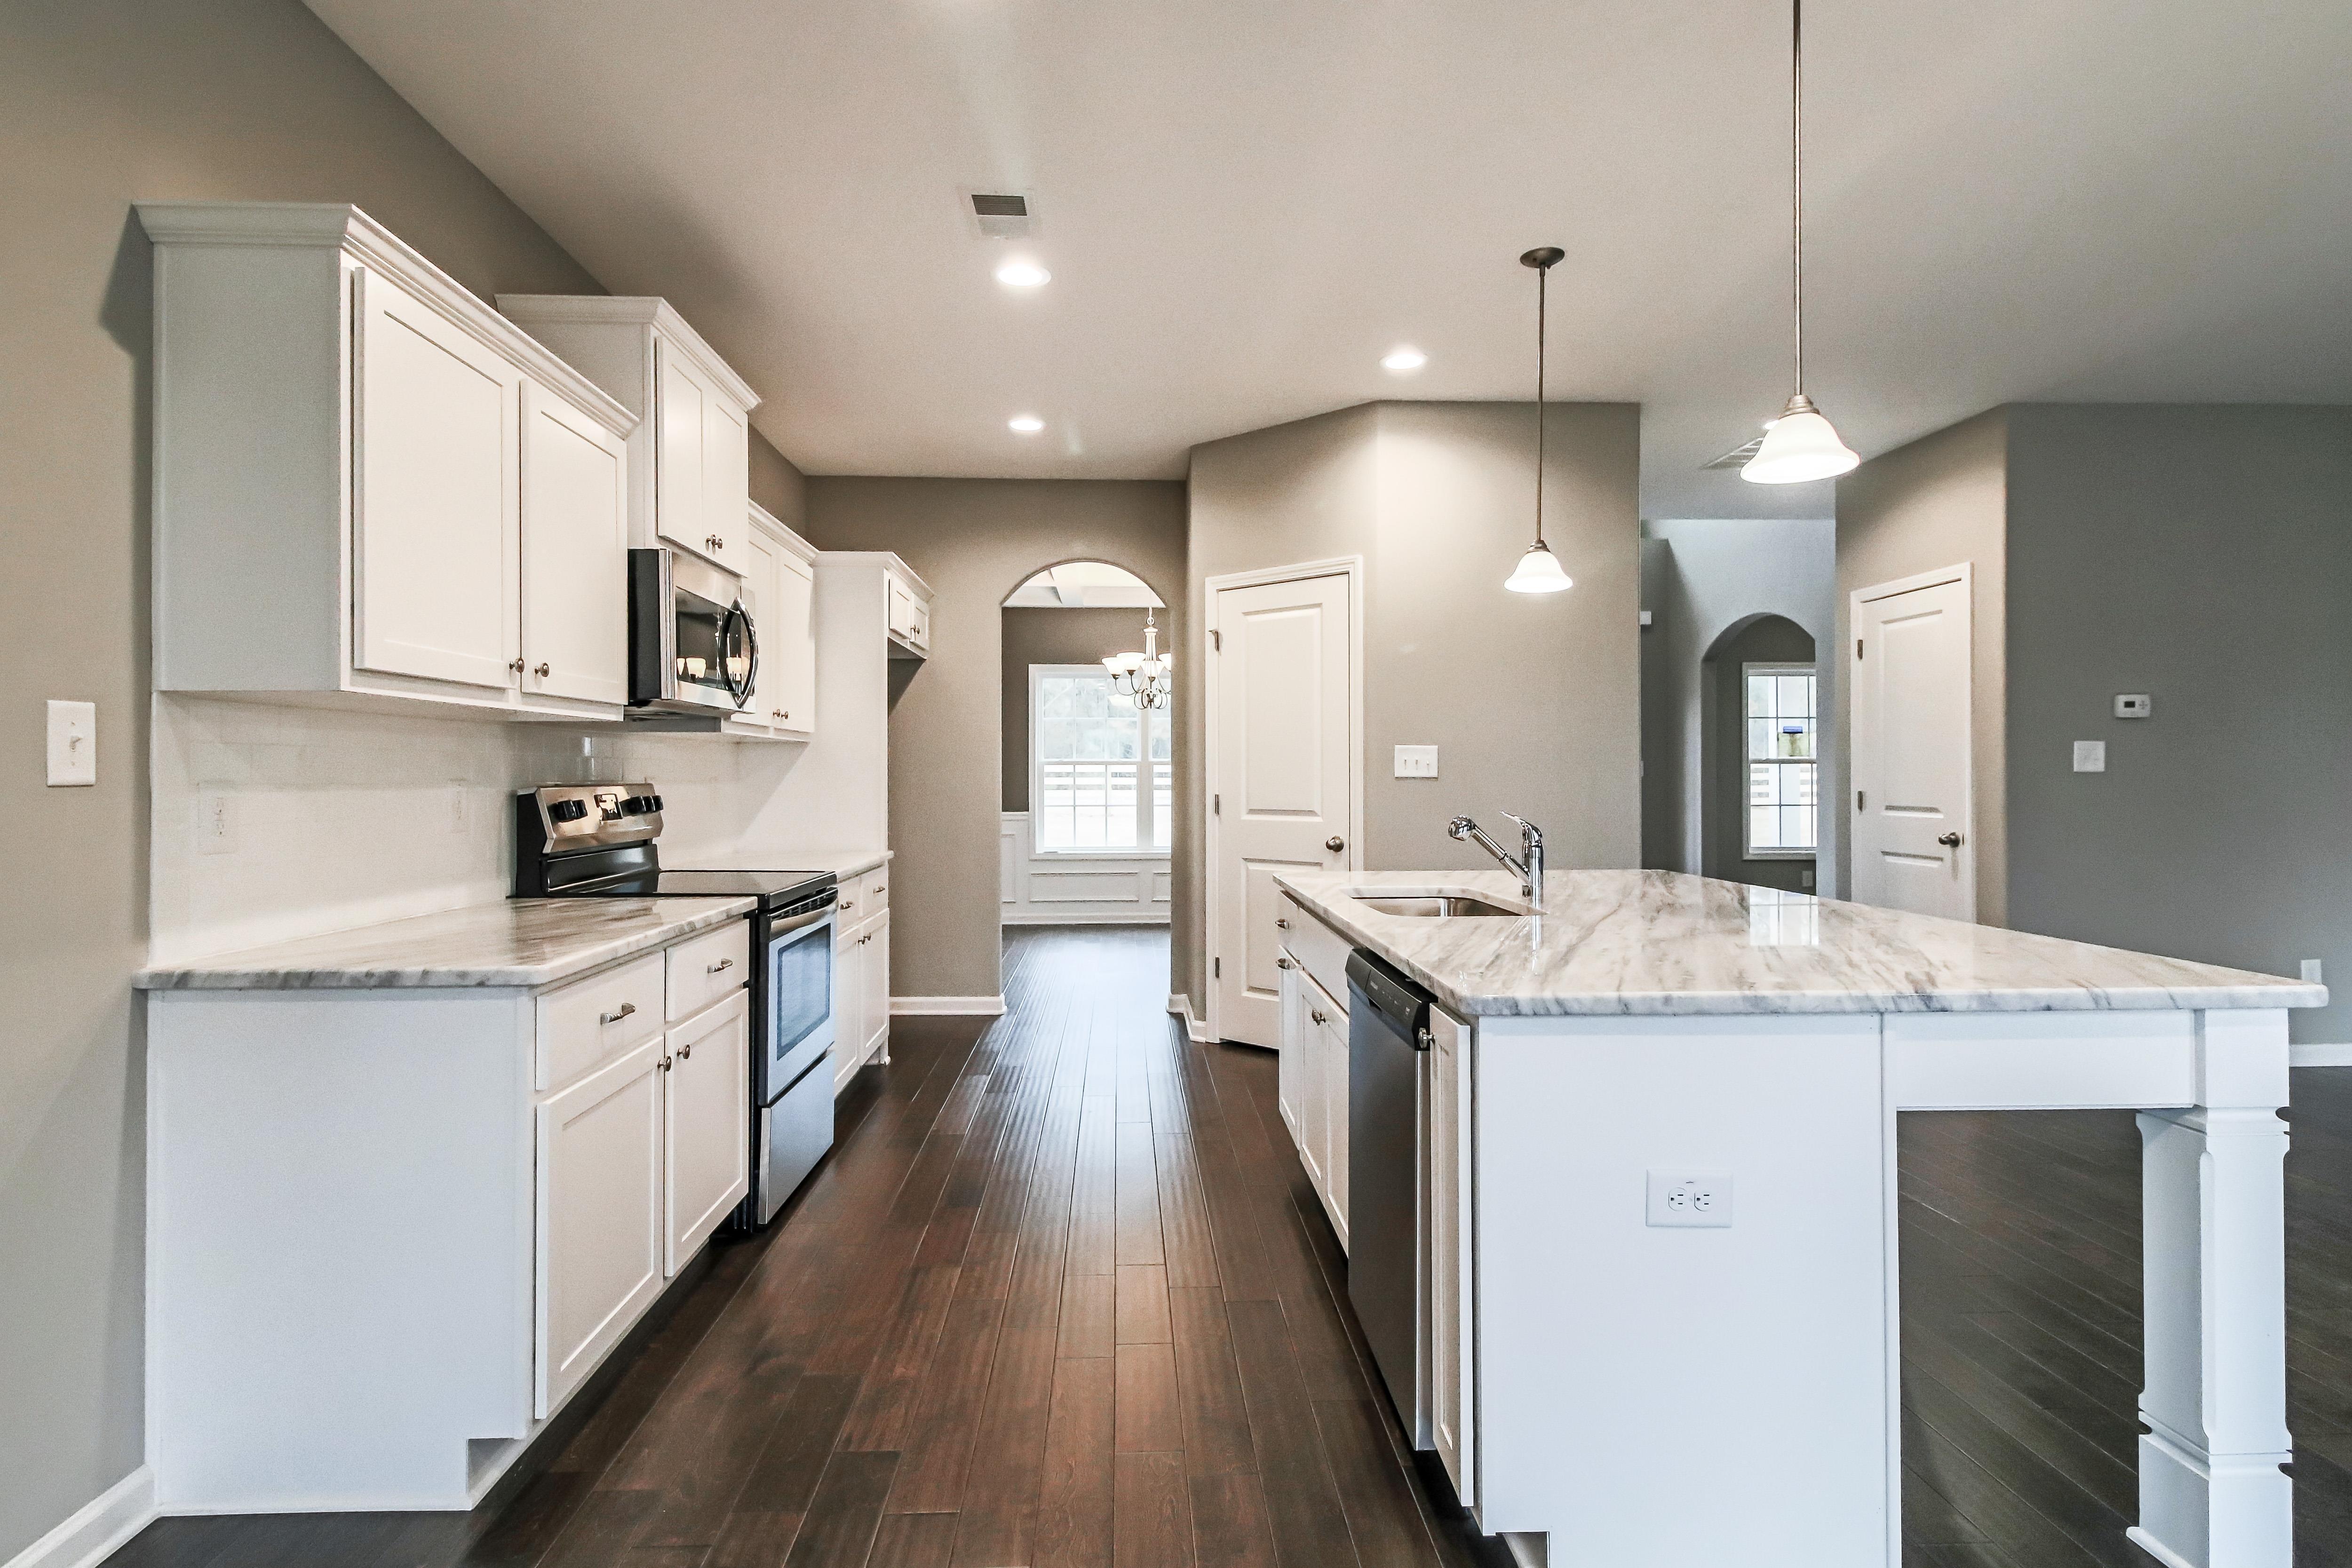 Kitchen featured in the Jackson By Hughston Homes in Auburn-Opelika, AL